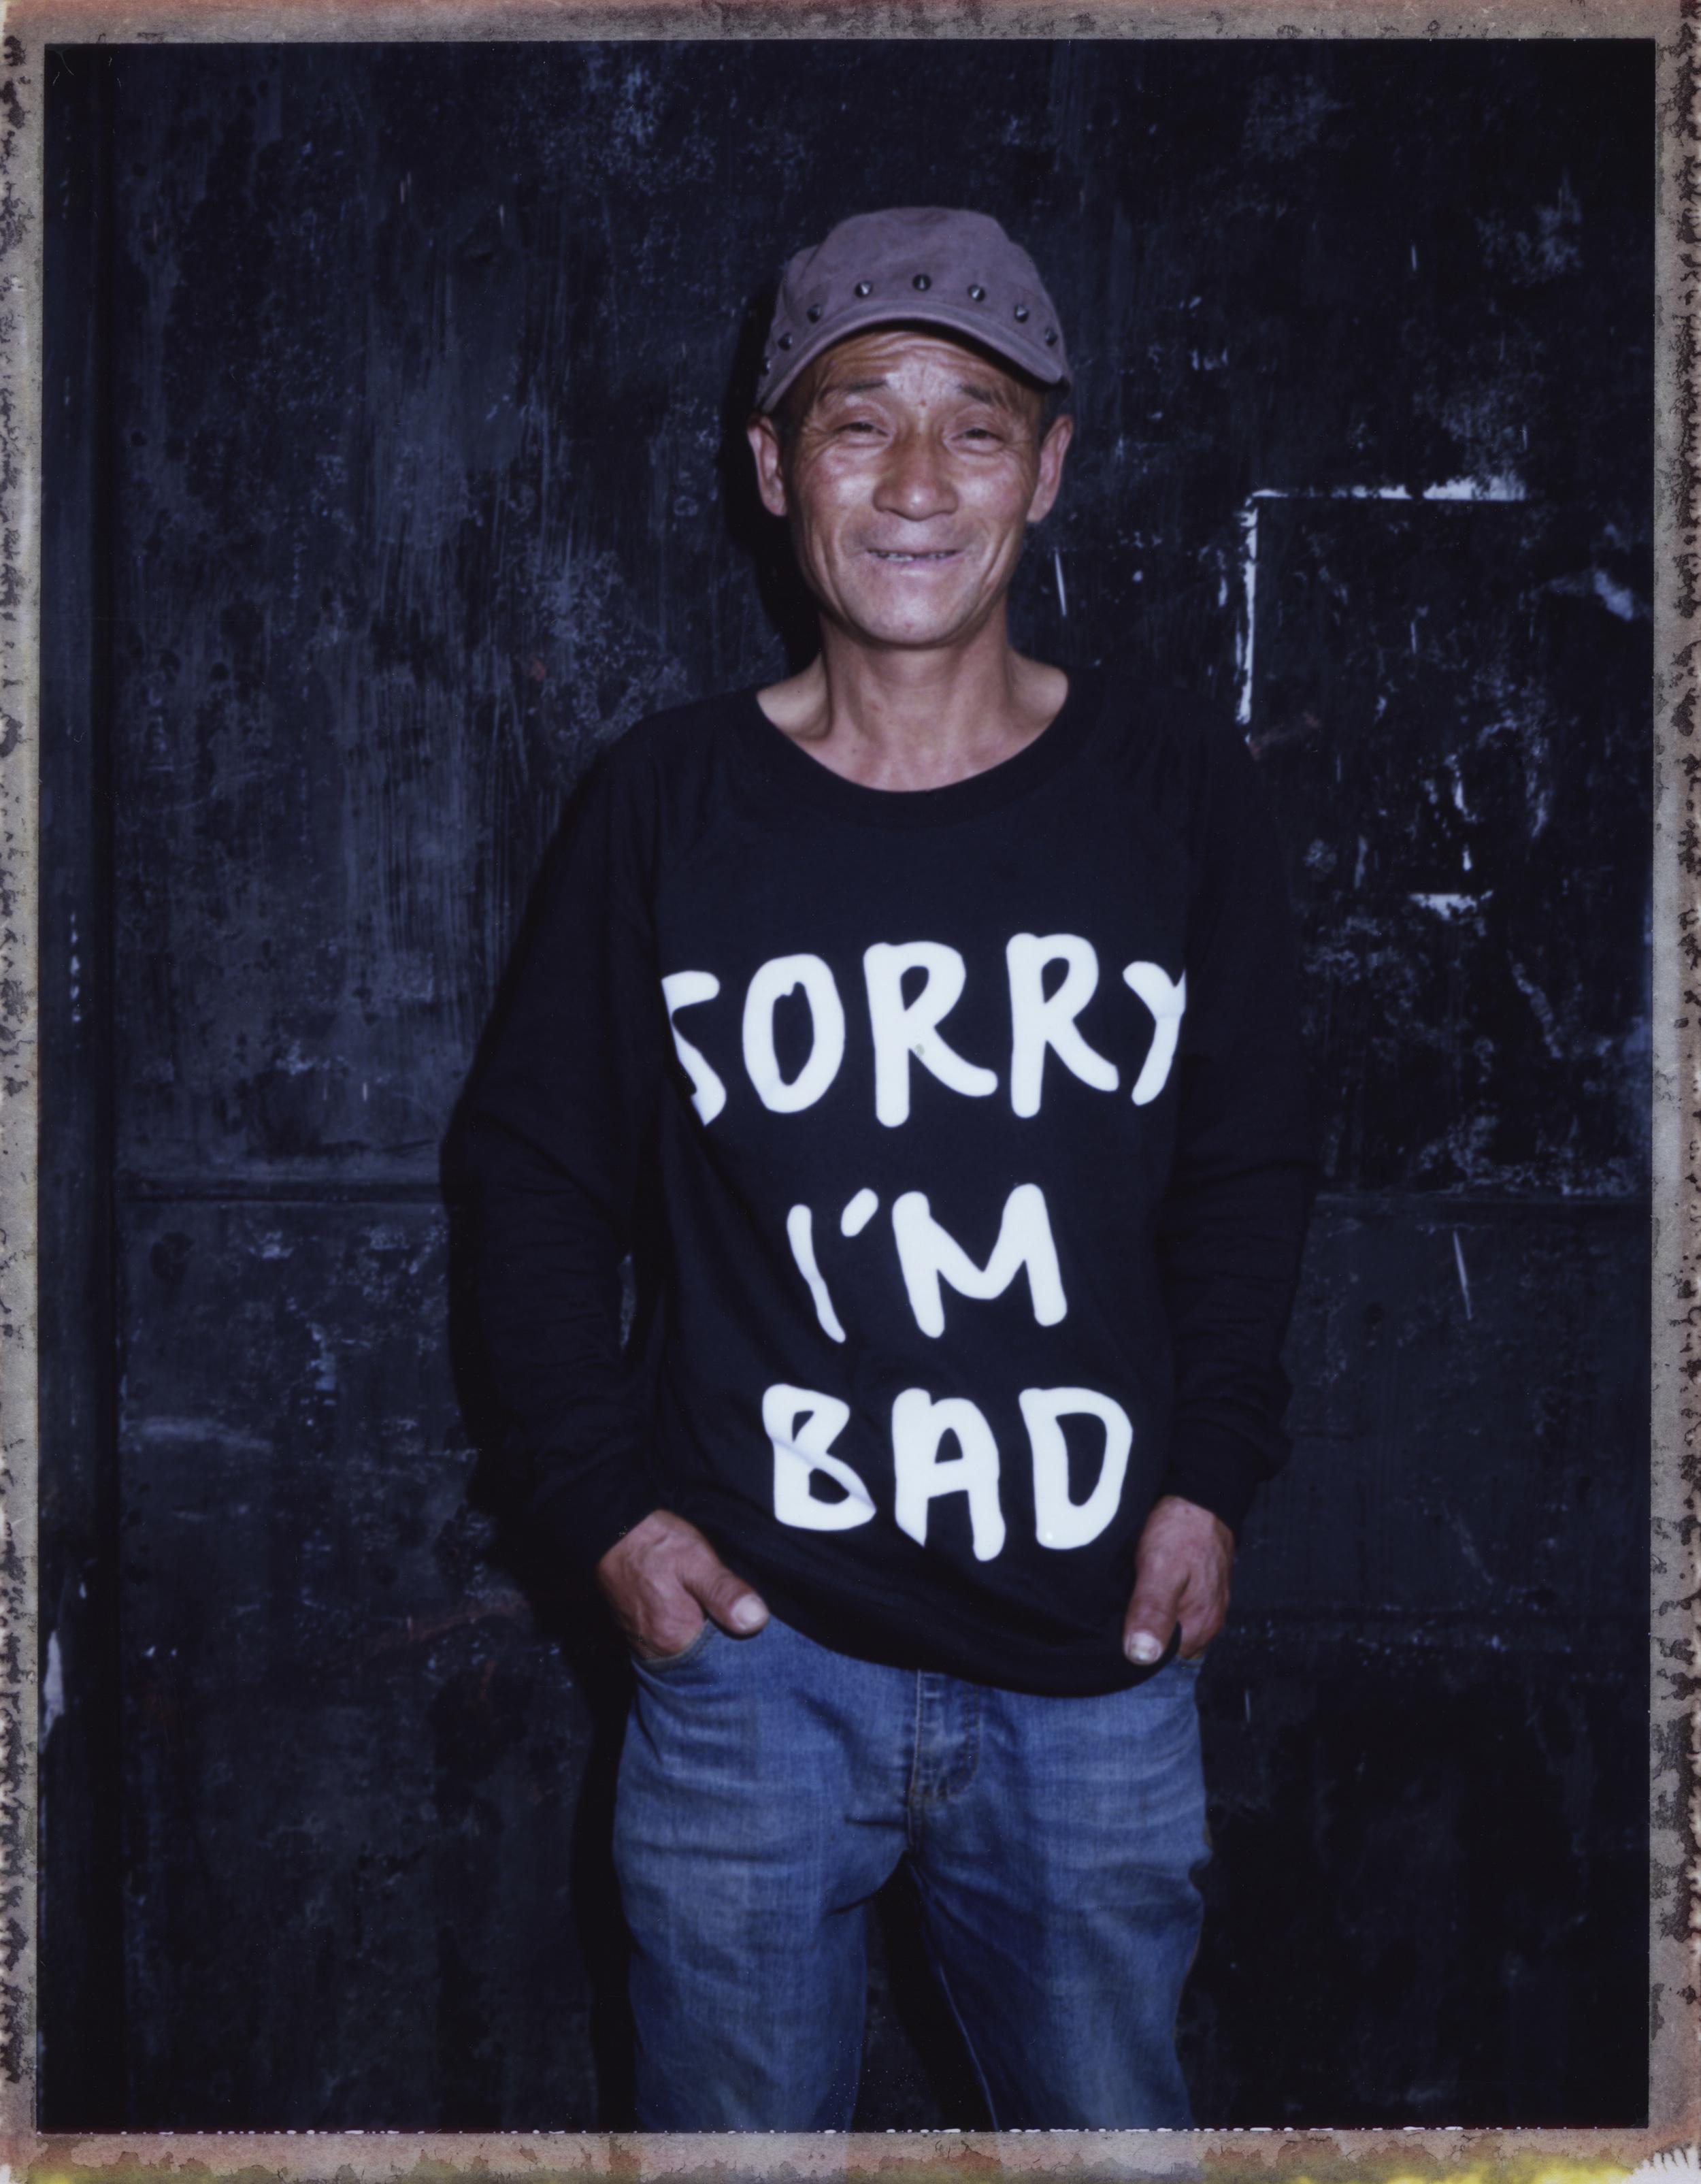 Sorry Im Bad.jpg